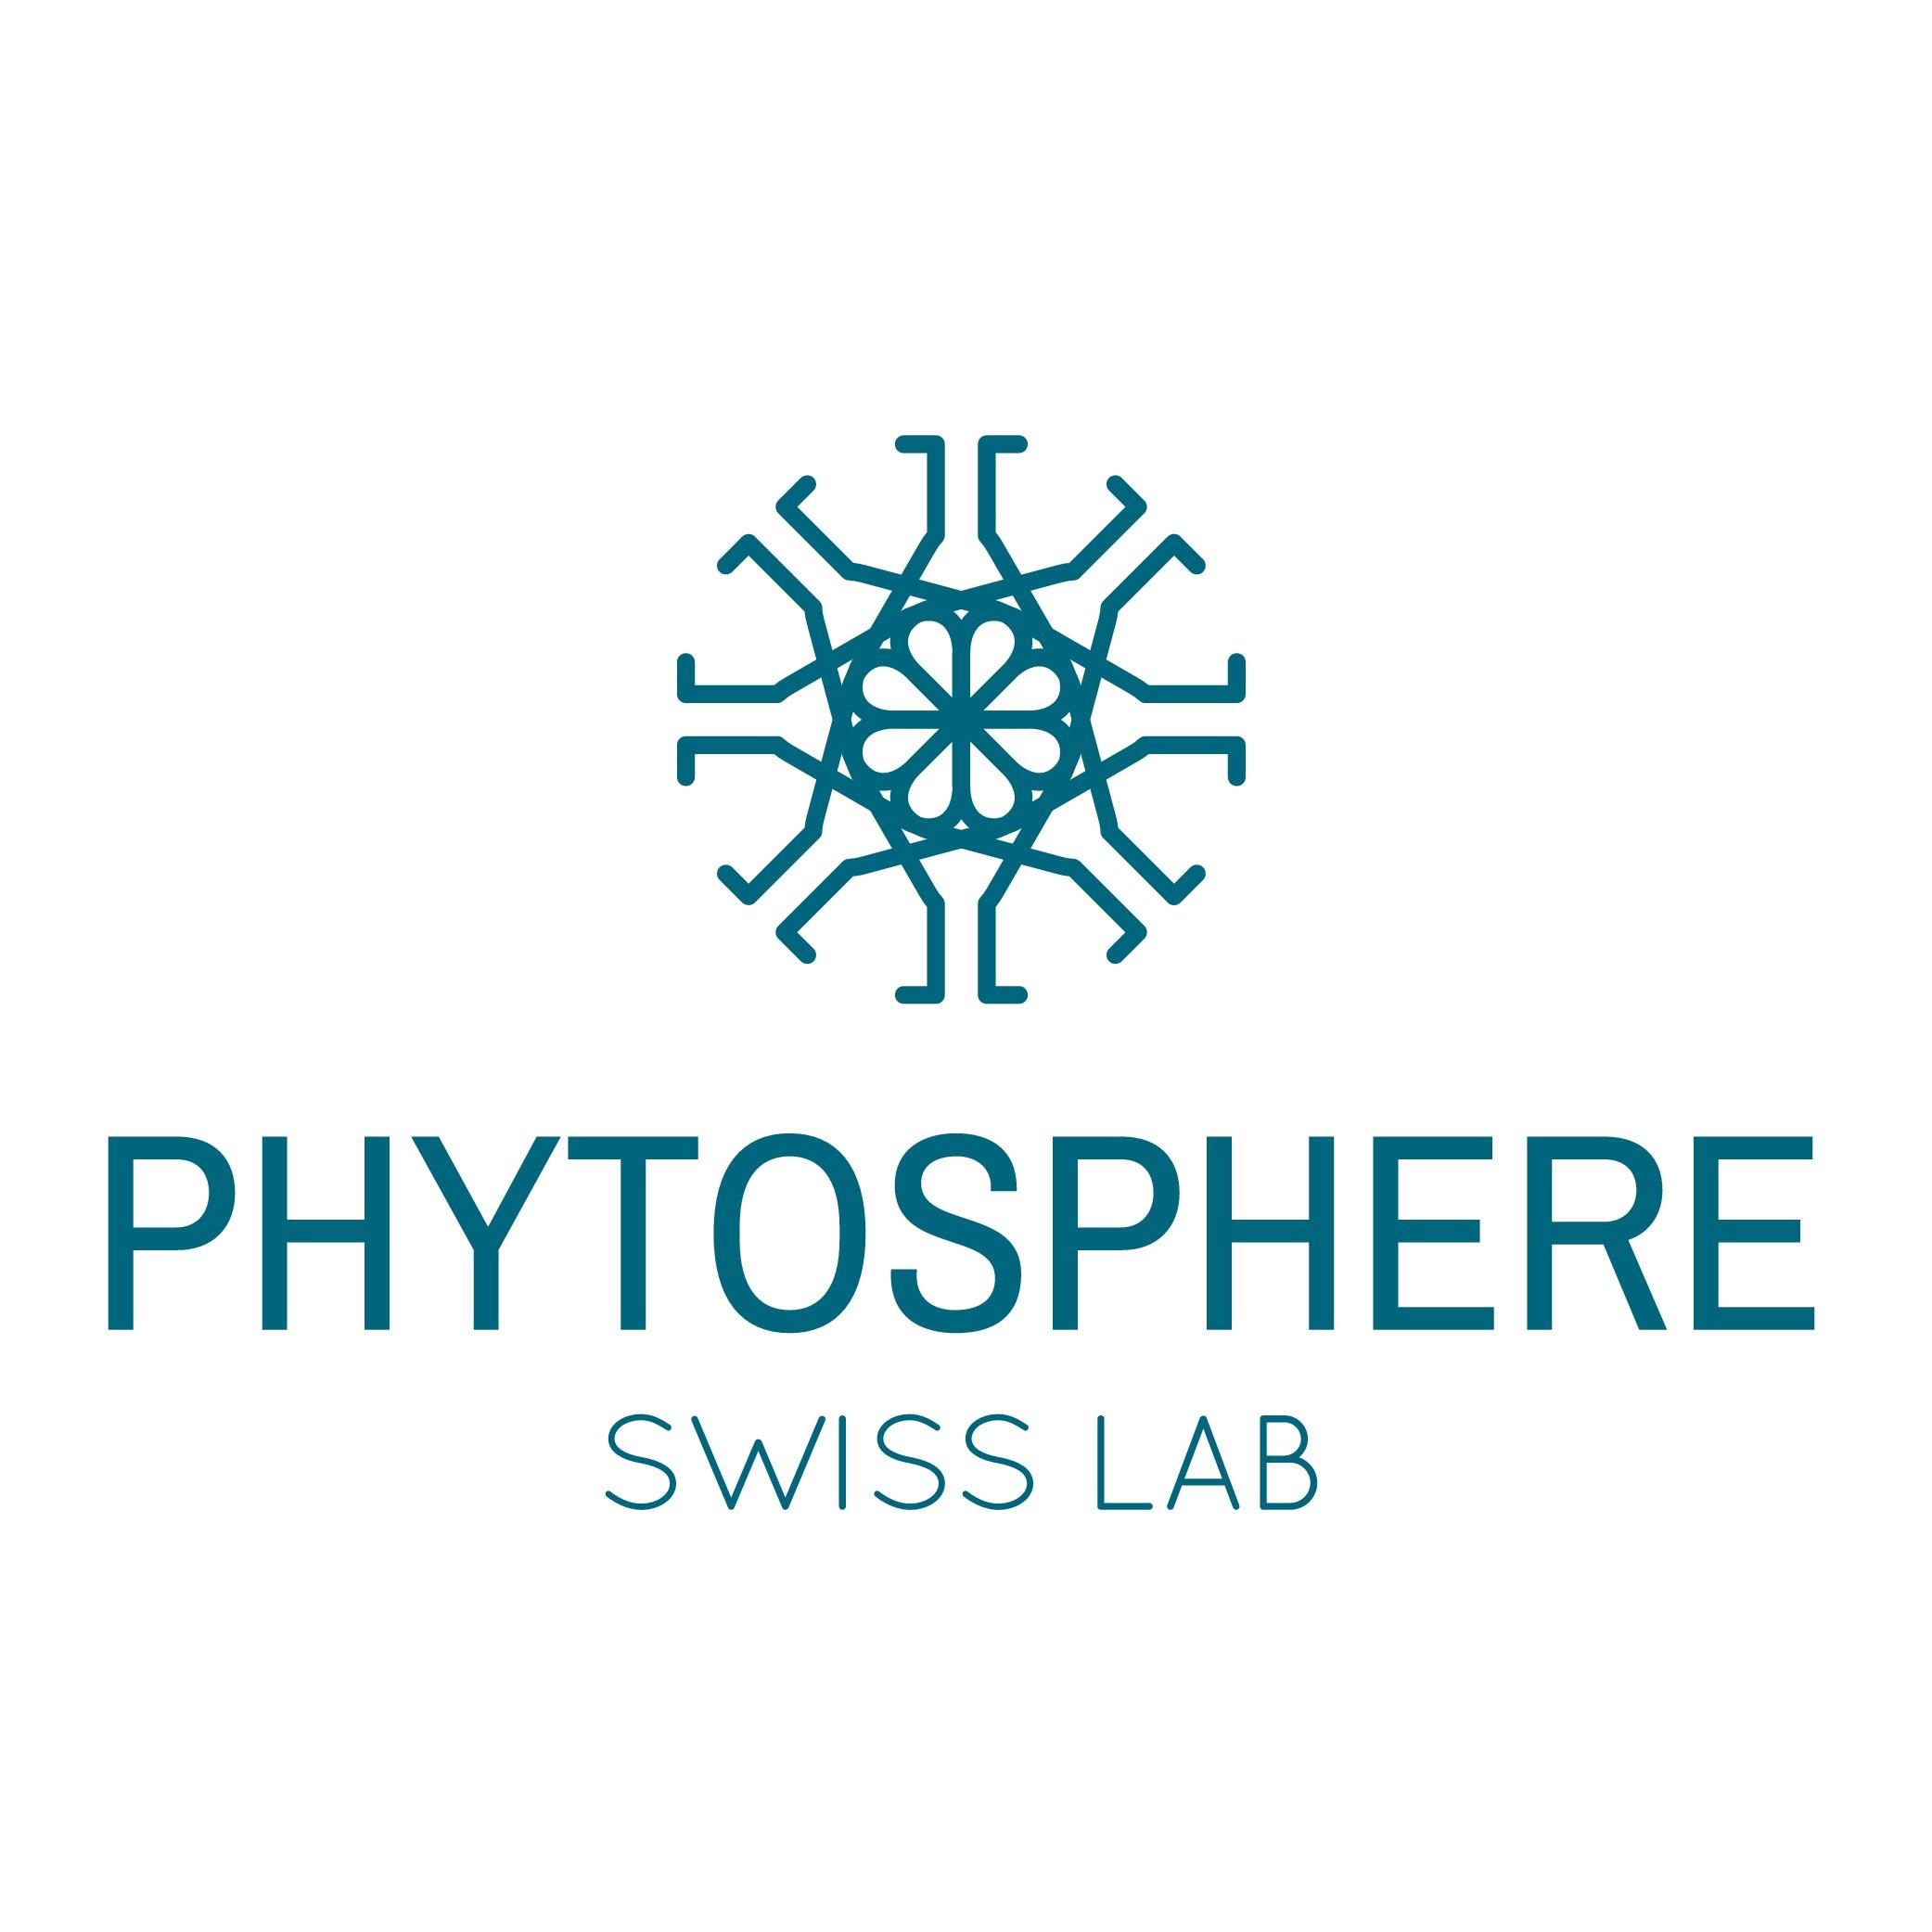 Création logo Phytosphere Swiss Lab